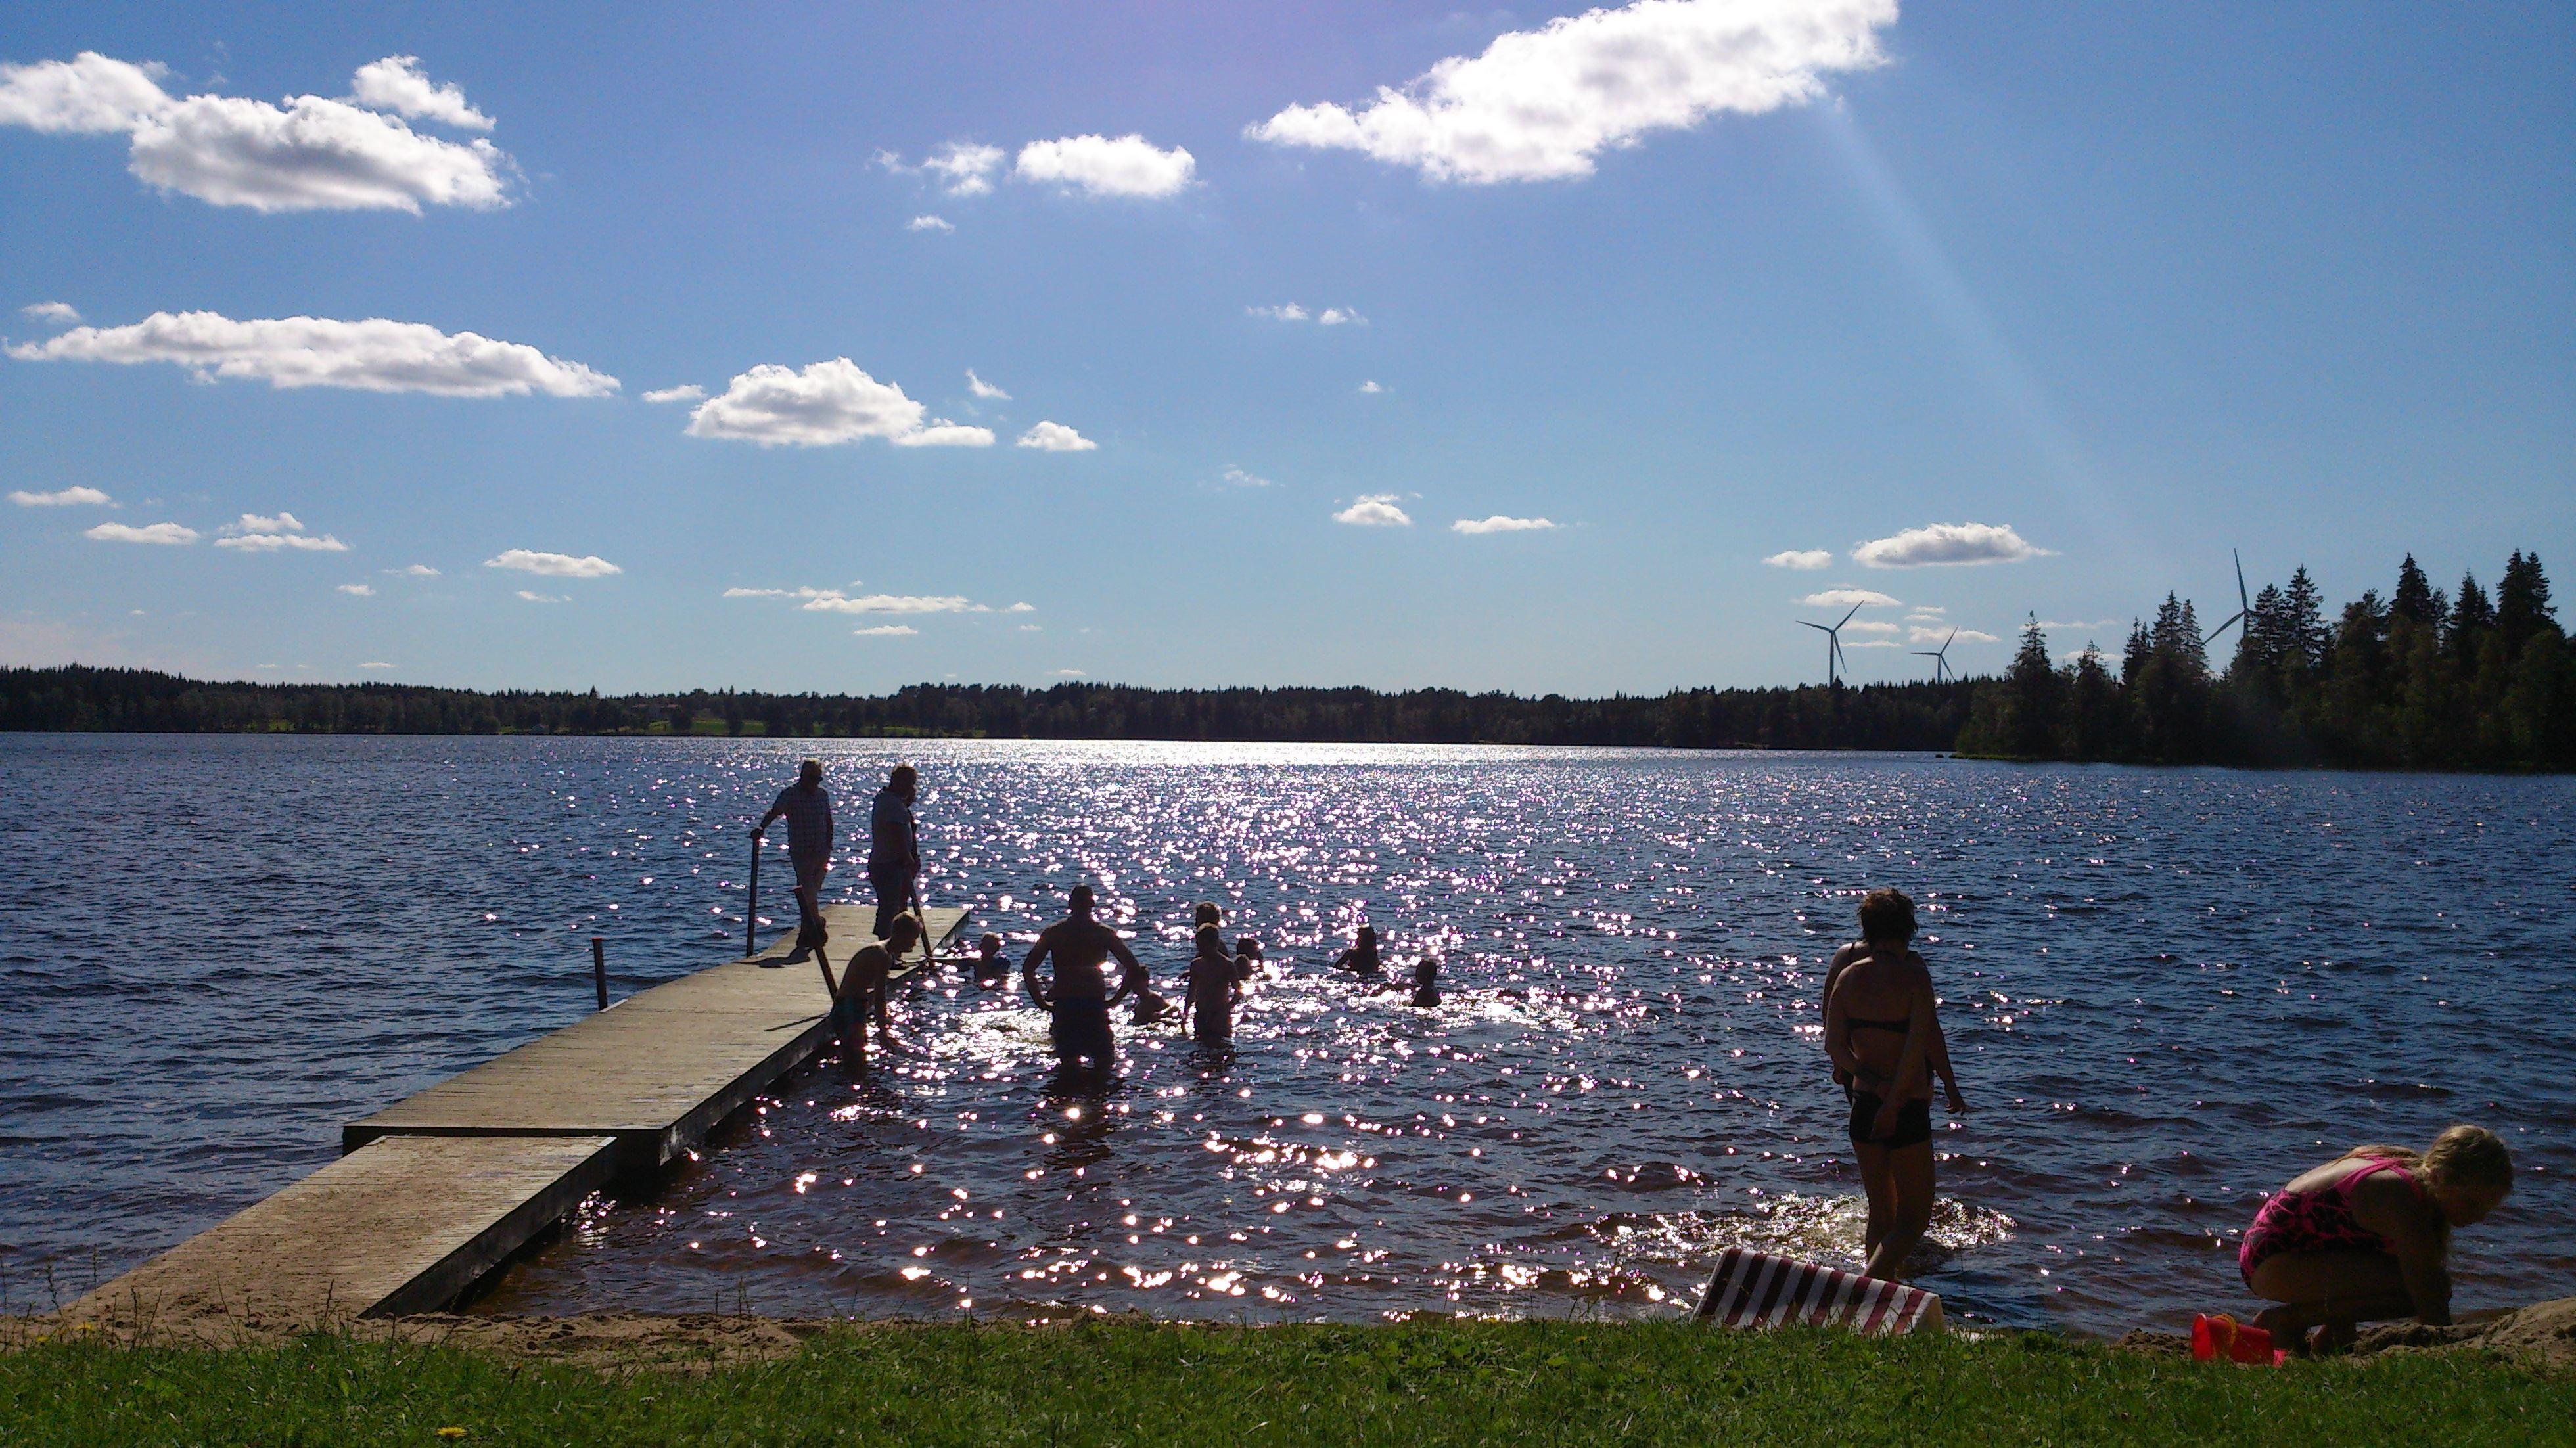 Fredriksdals badplats, Fredriksdalssjön